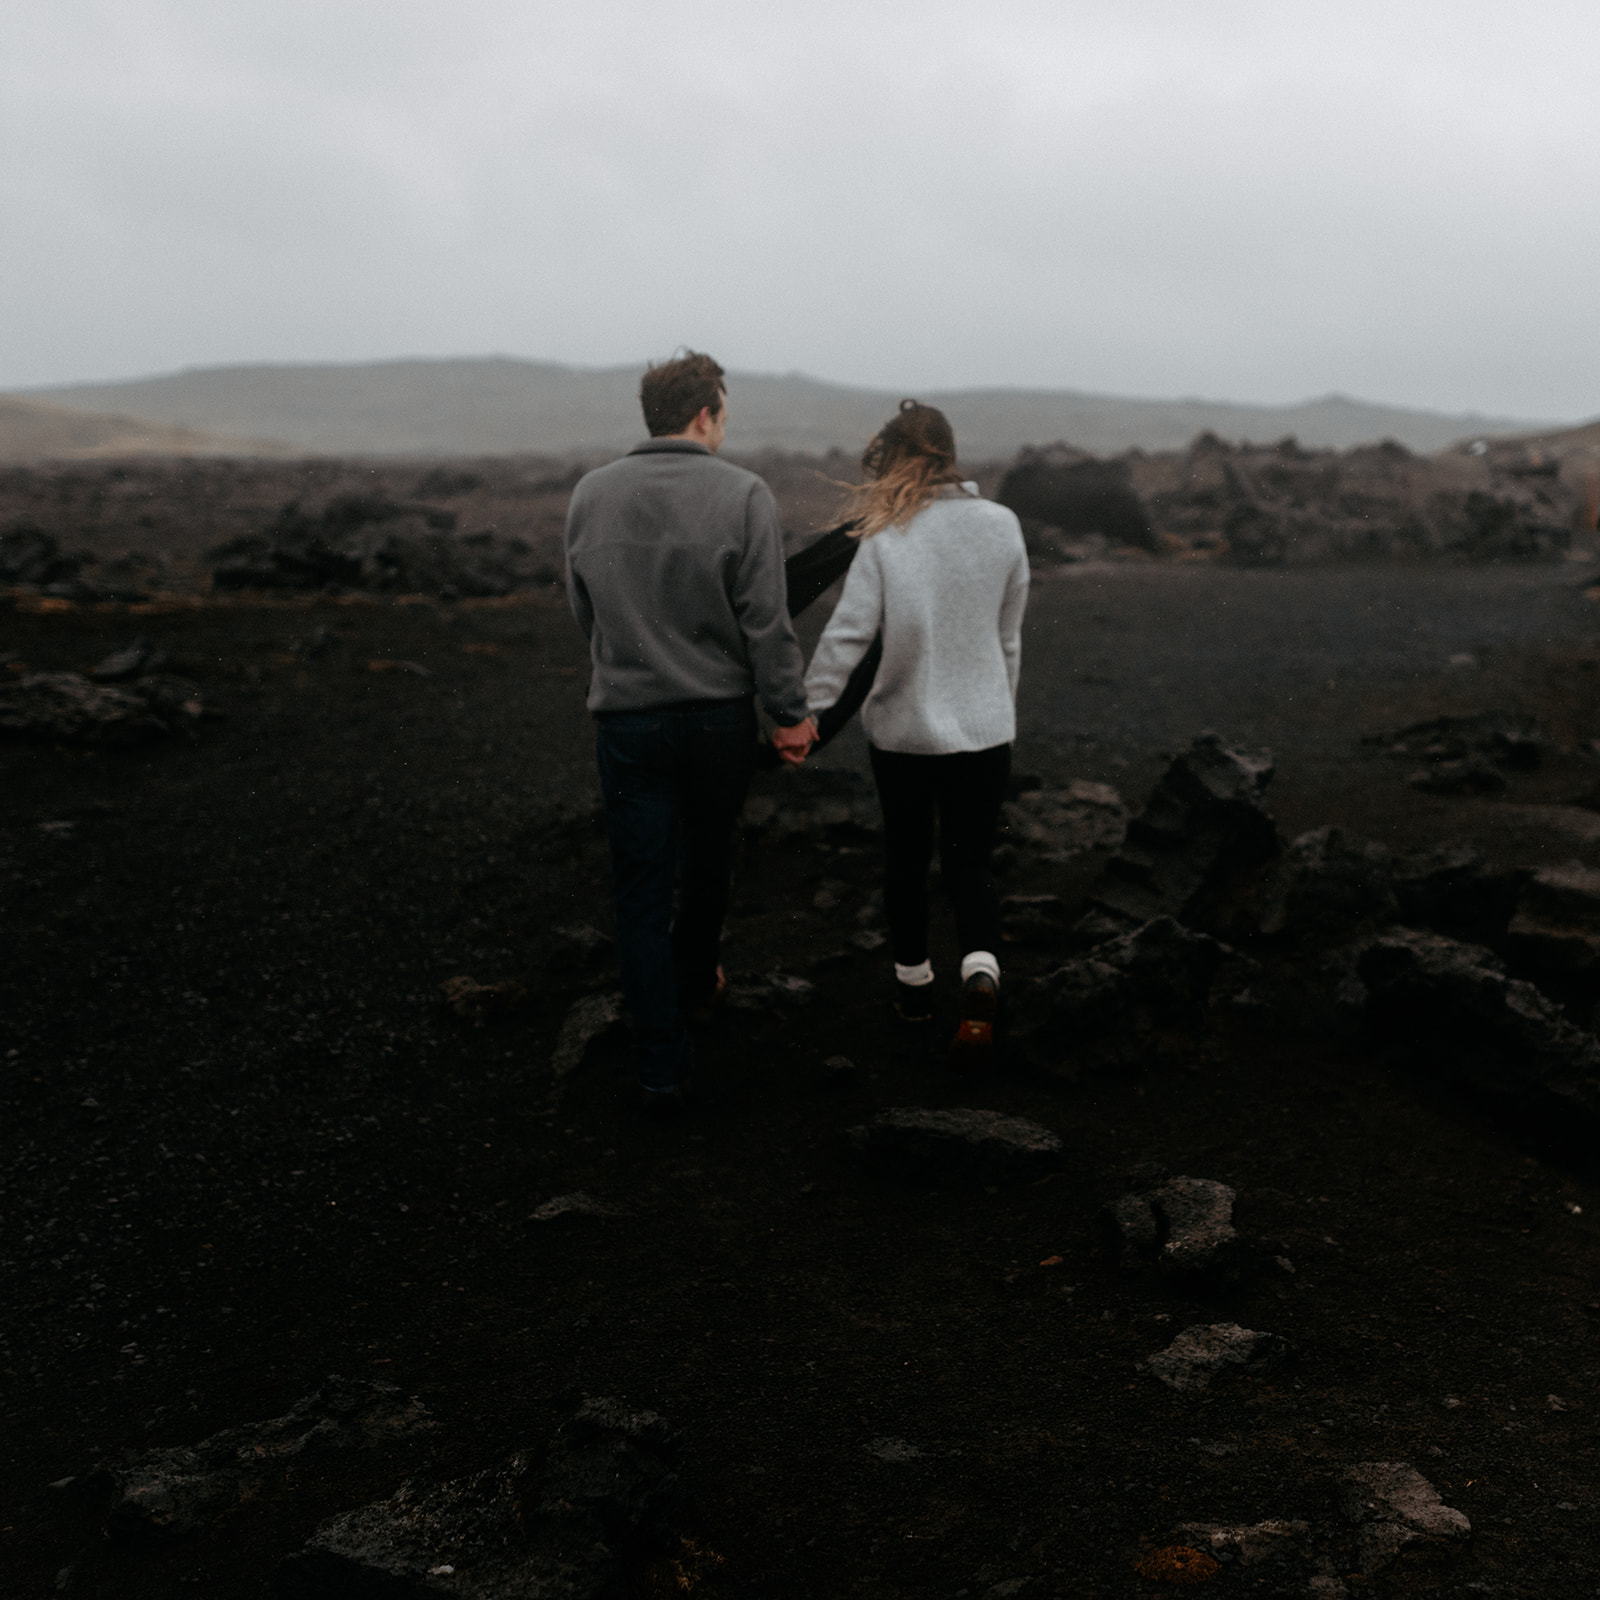 Mack & Michael - Sesja na Islandii 3 alebosco islandia mm 2